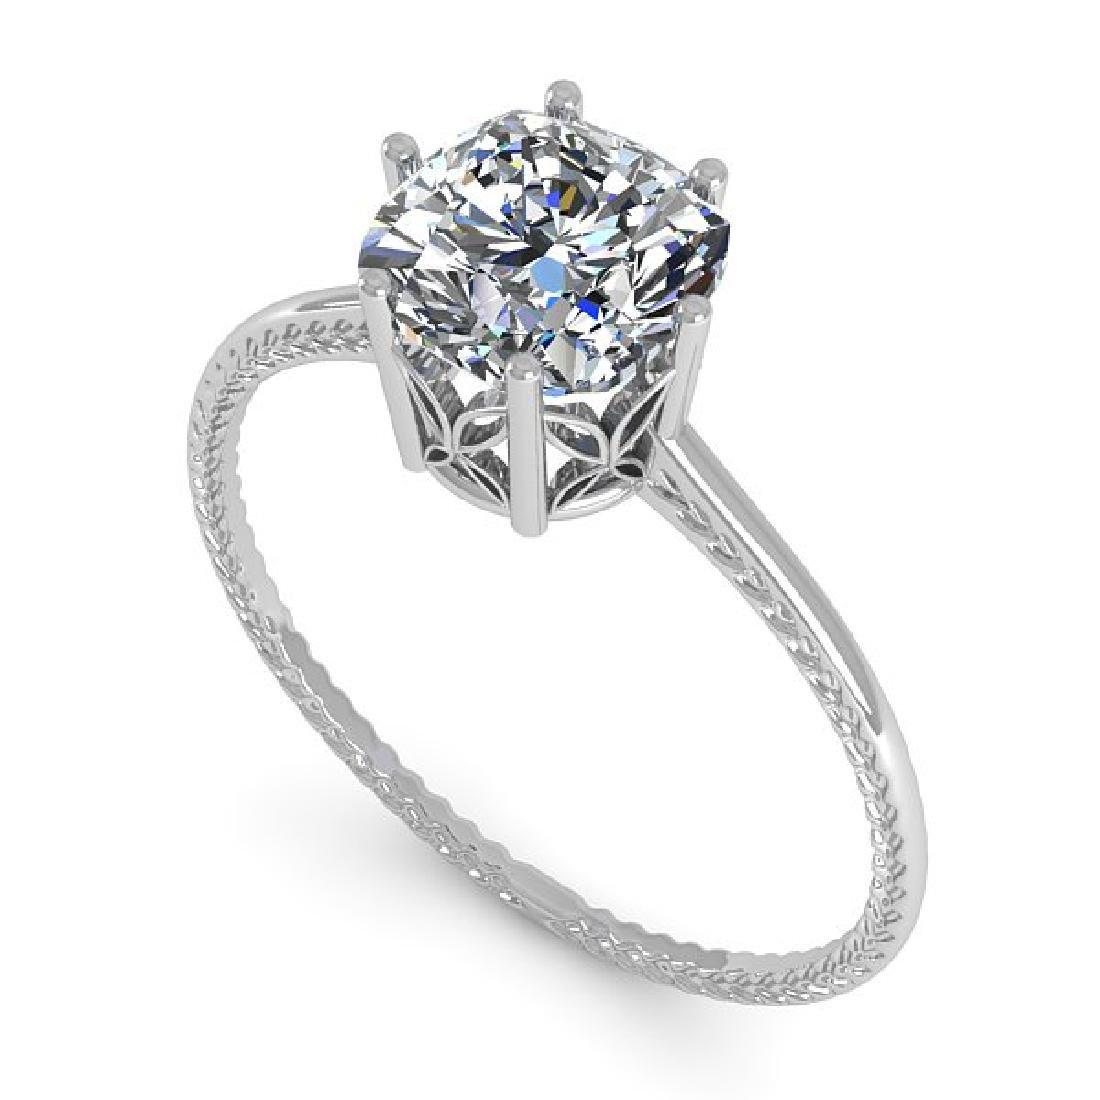 1.0 CTW VS/SI Cushion Diamond Art Deco Ring 14K White - 2